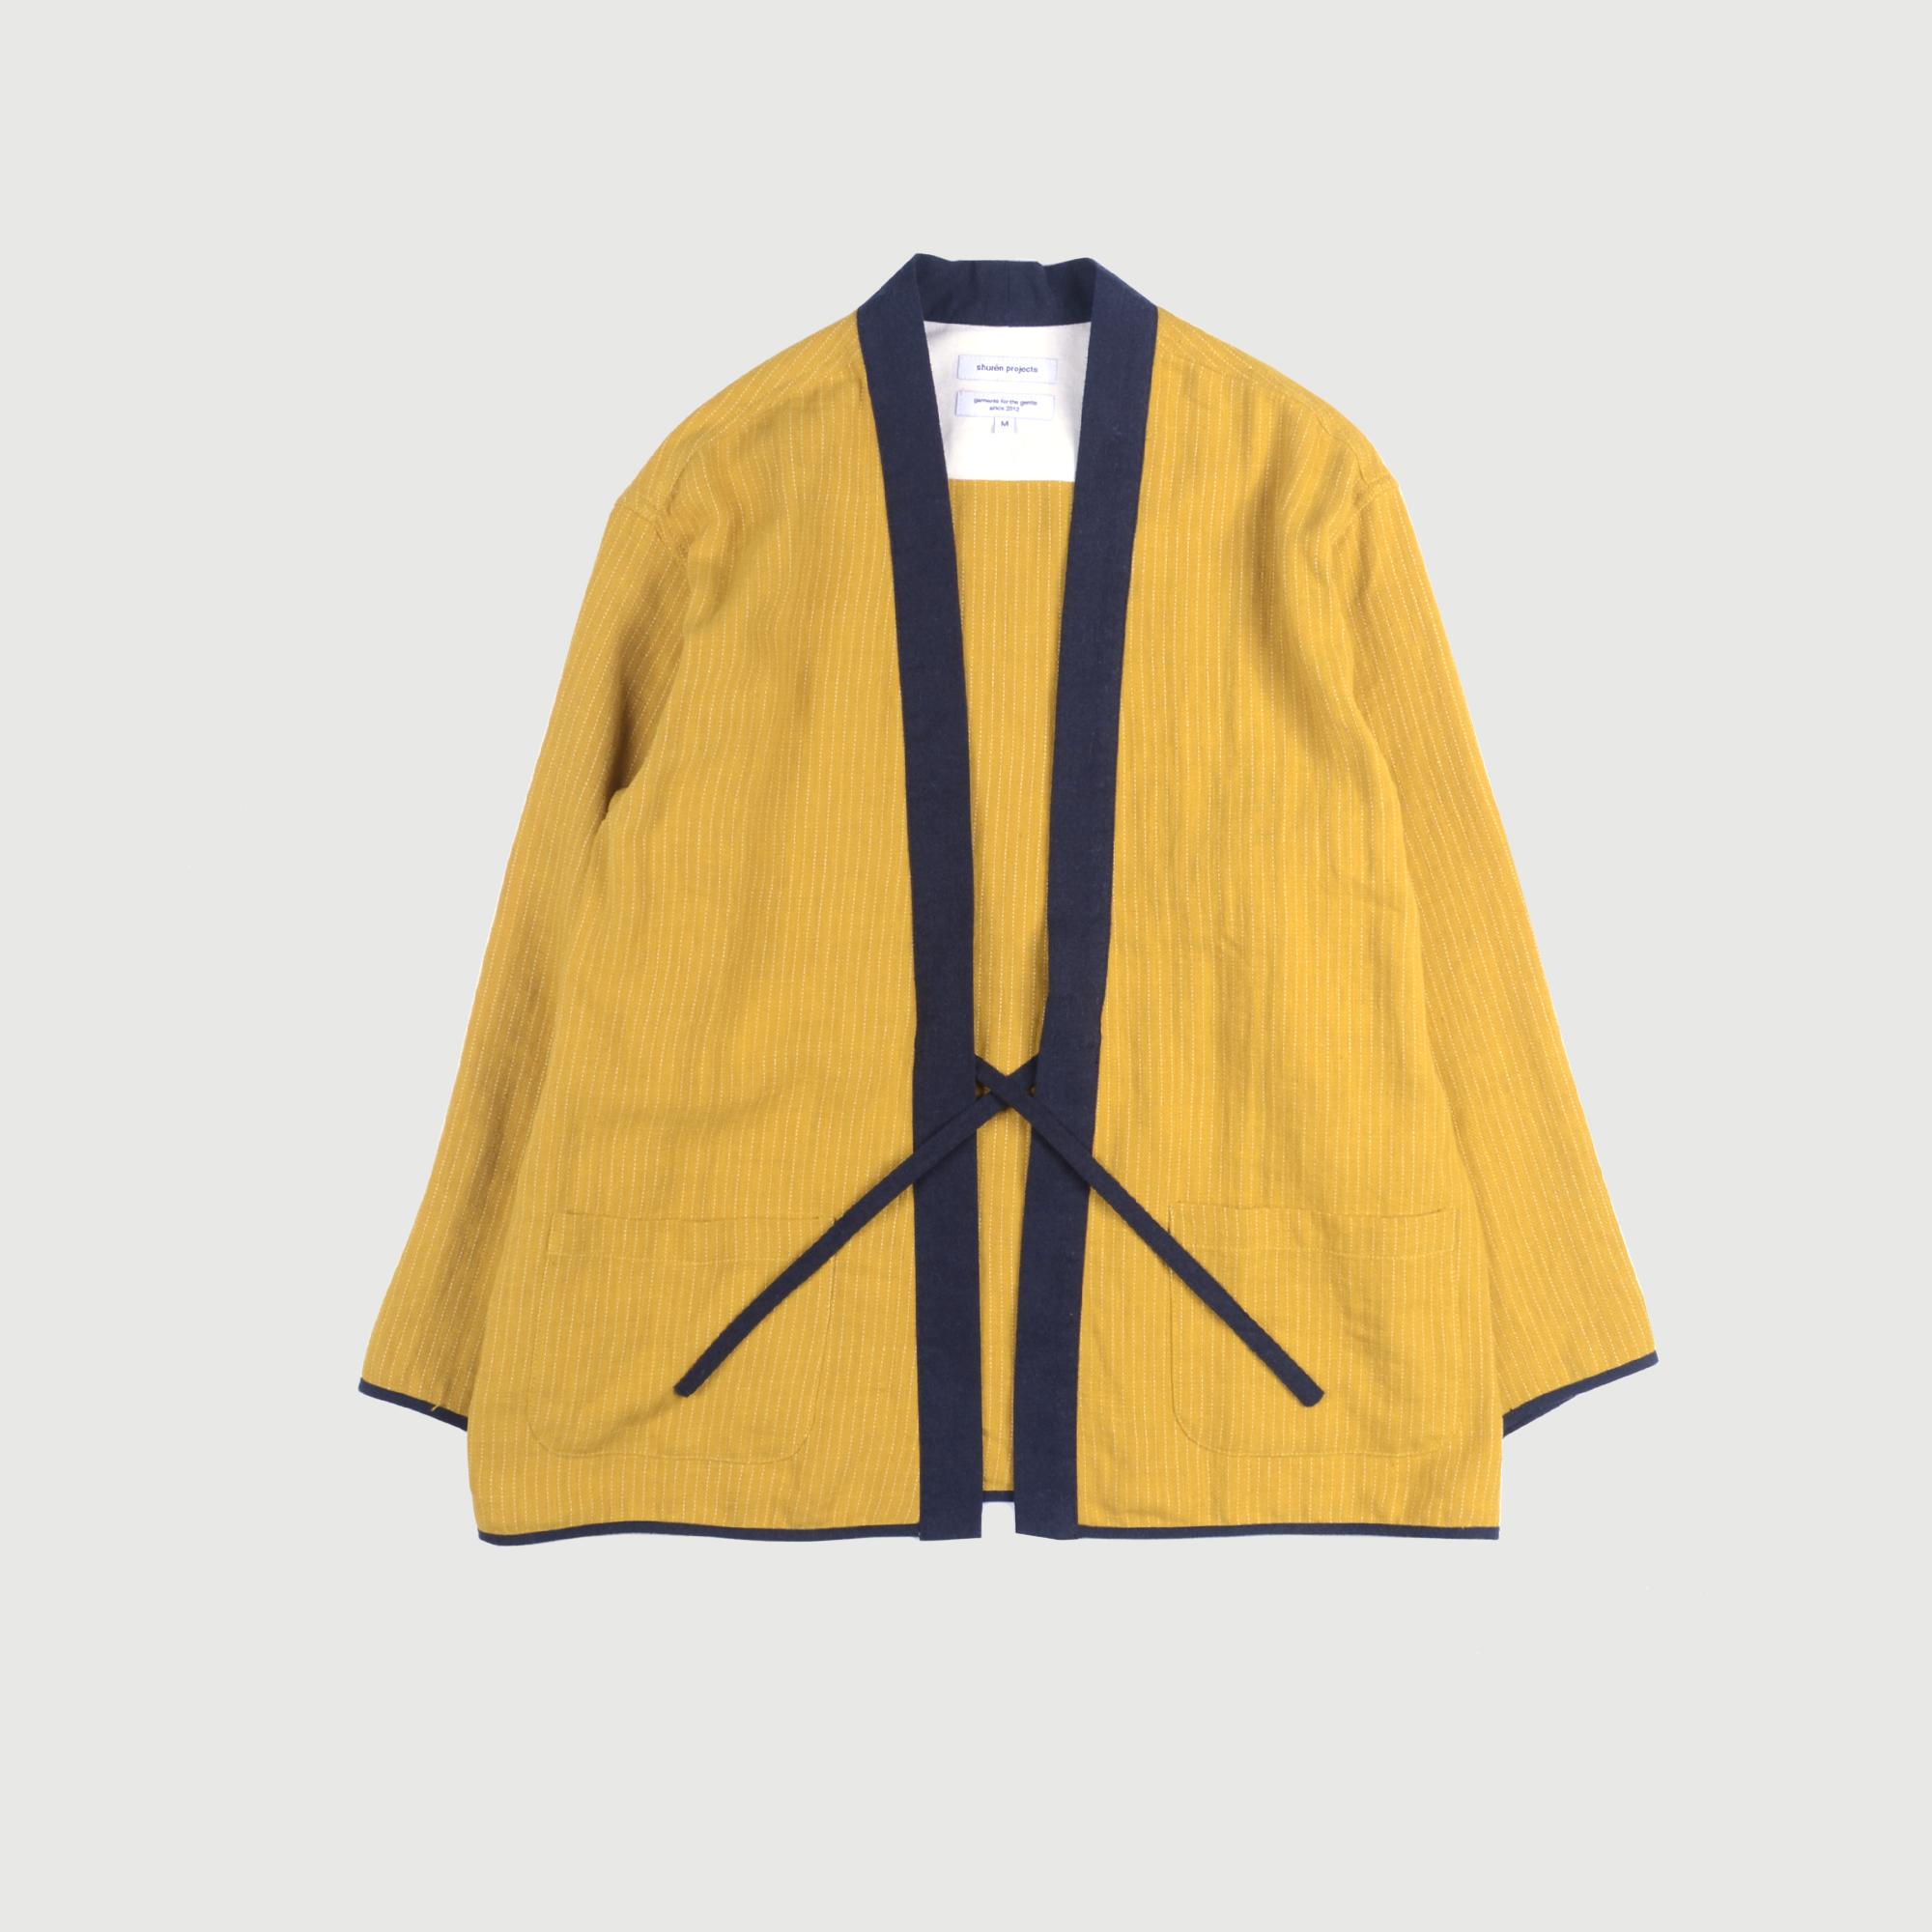 Noragi Mustard - Shuren Projects, $85